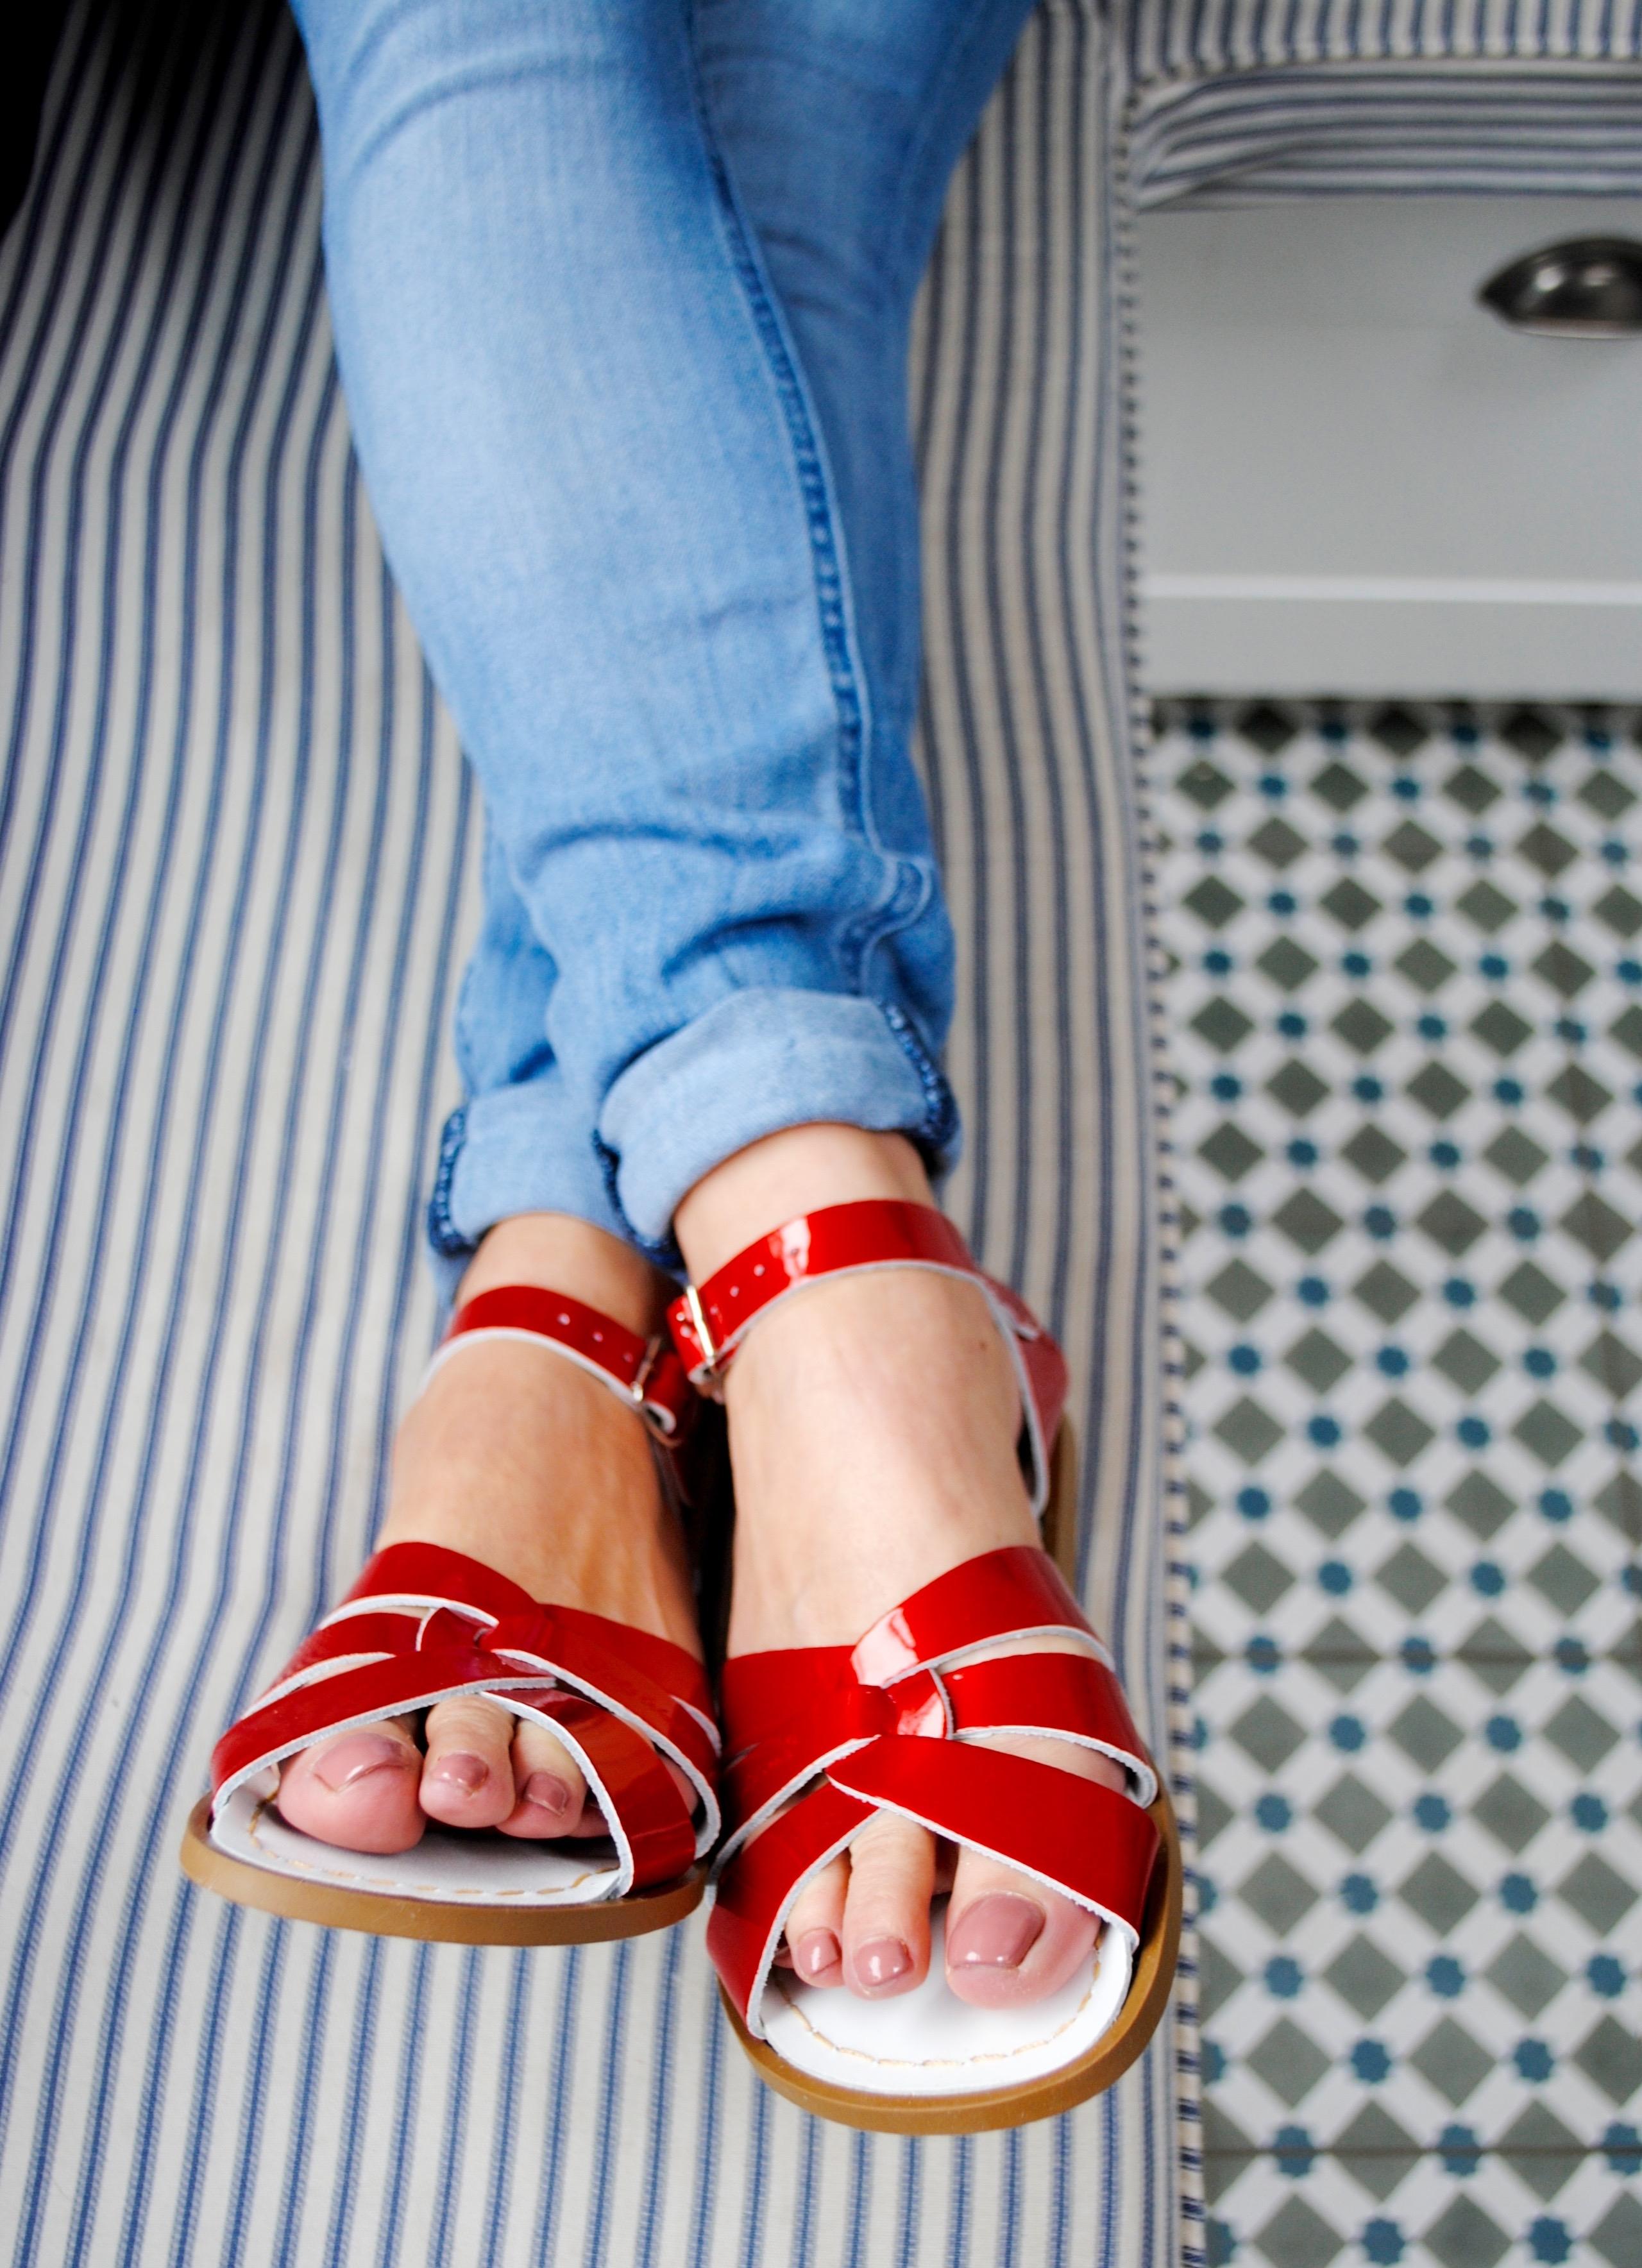 help me get my feet: